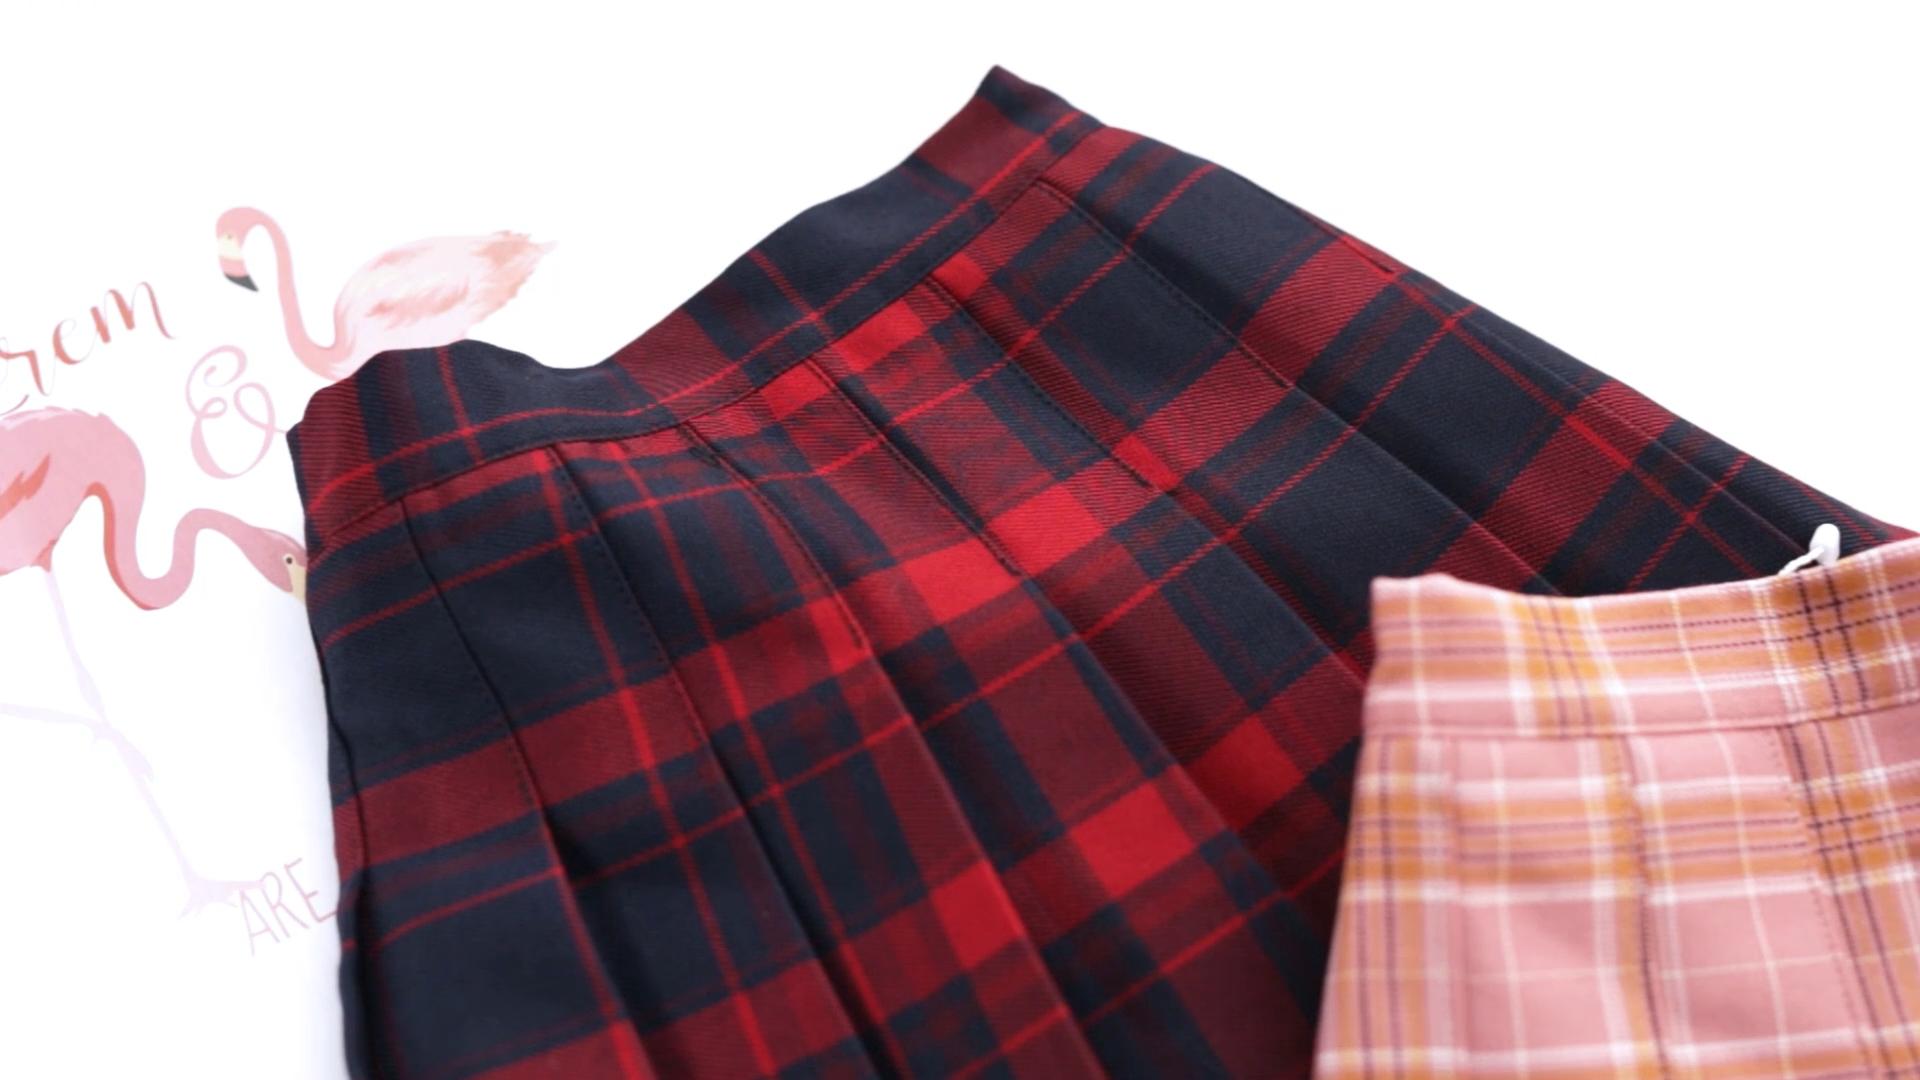 बच्चों लड़कियों Pleated प्लेड स्कर्ट उच्च कमर लड़की स्कूल वर्दी मिनी चाकू Pleated स्कर्ट